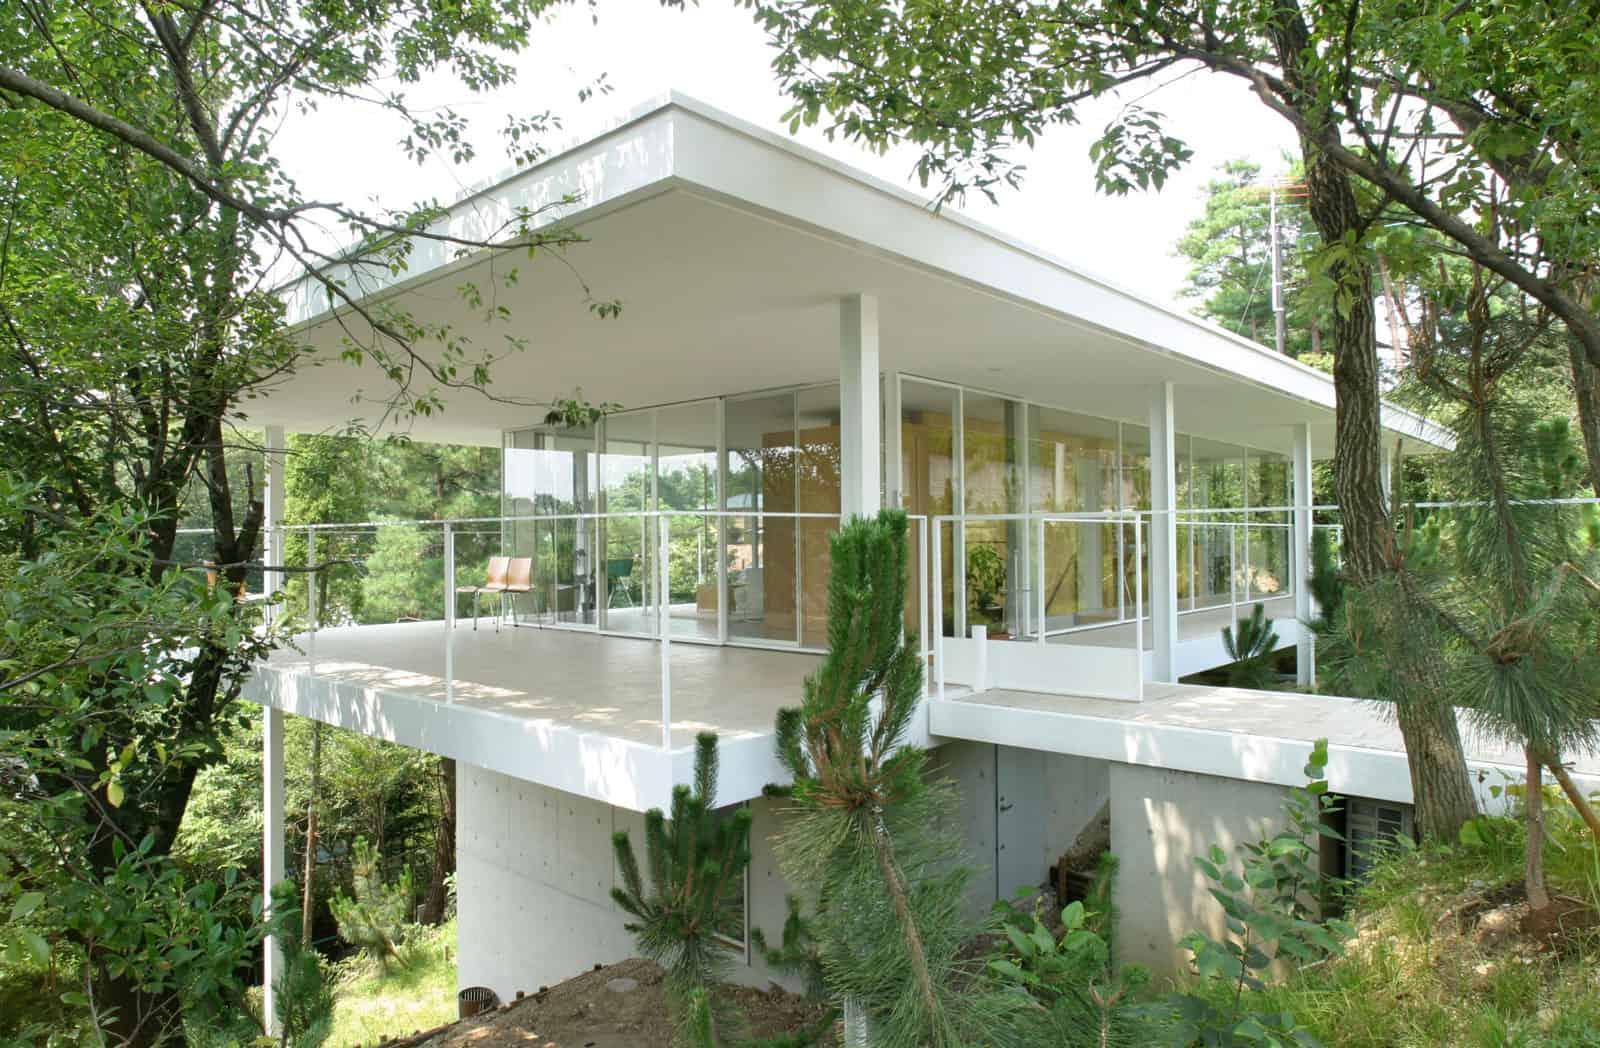 Suishouen House by Tomoaki Uno Architects (1)